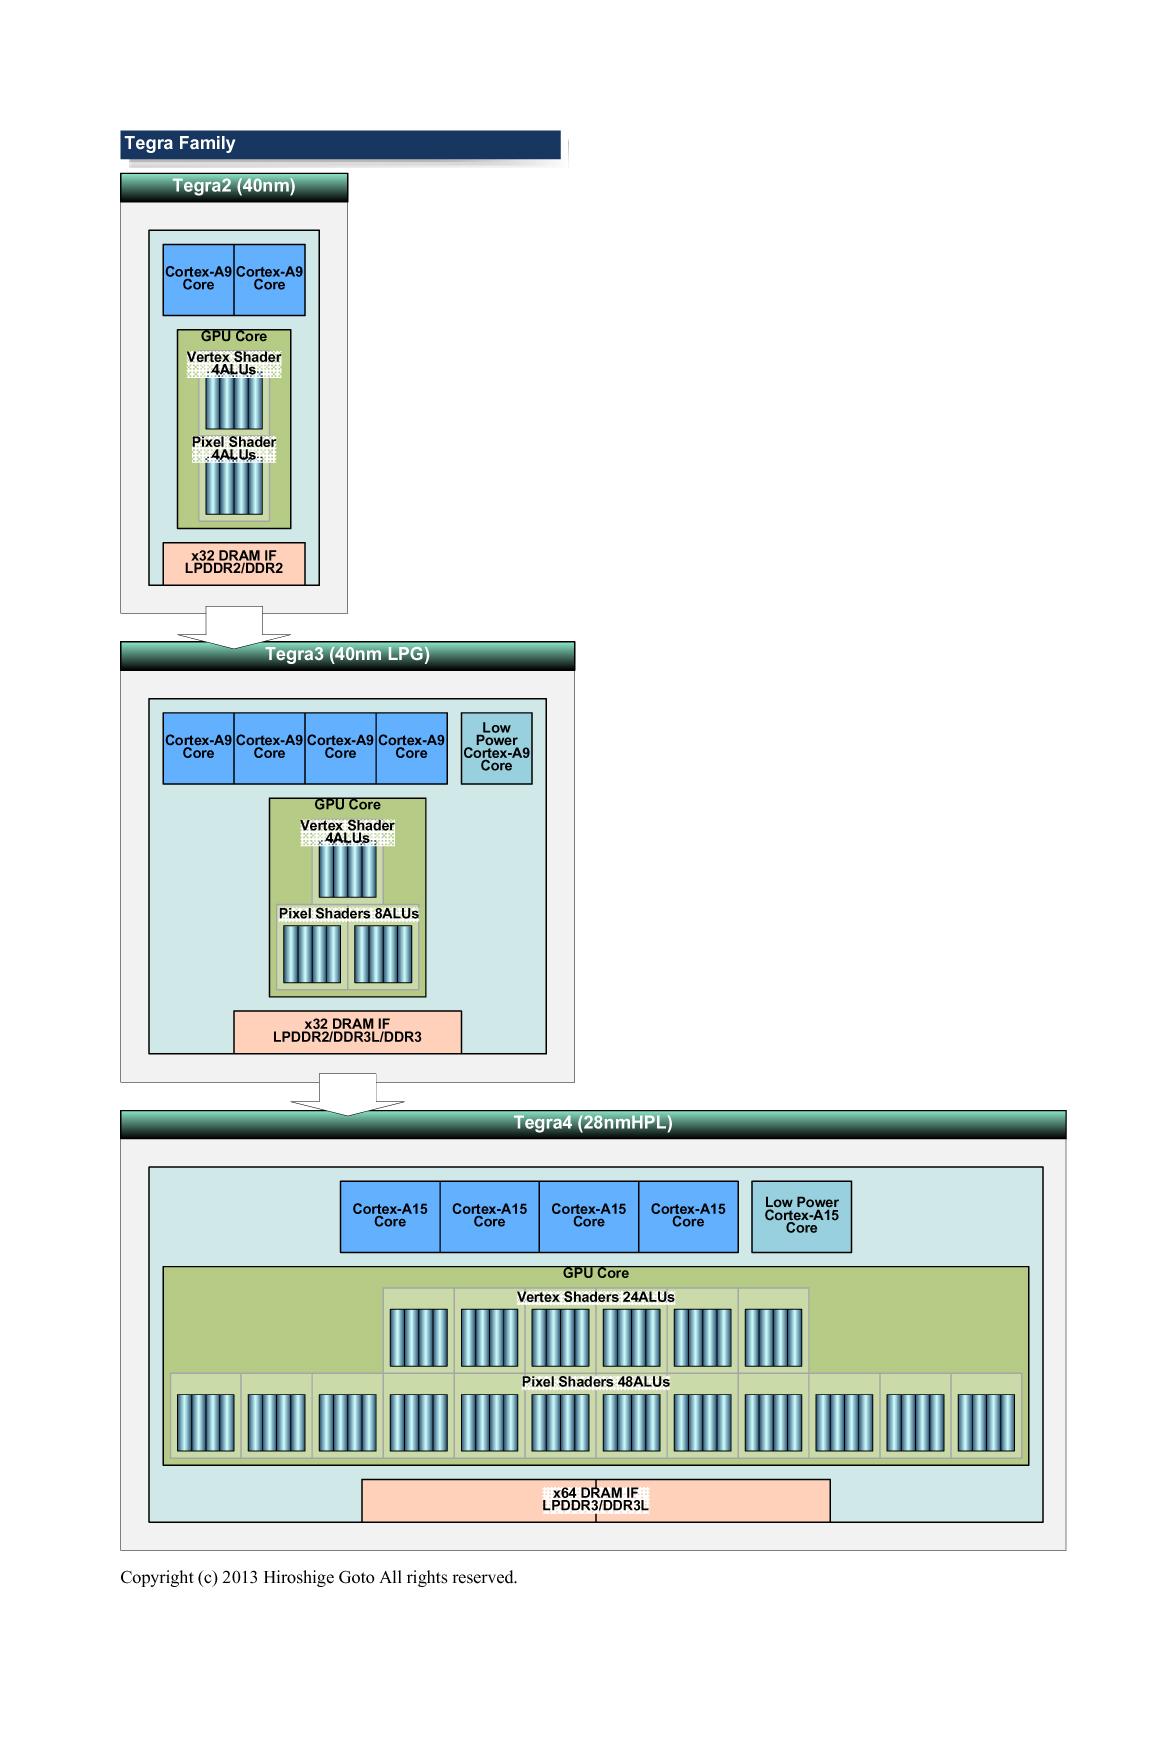 "TegraのALU<br class="""">PDF版は<span class=""img-inline raw""><a href=""/video/pcw/docs/587/550/p16.pdf"" ipw_status=""1"" ipw_linktype=""filelink_raw"" class=""resource"">こちら</a></span>"